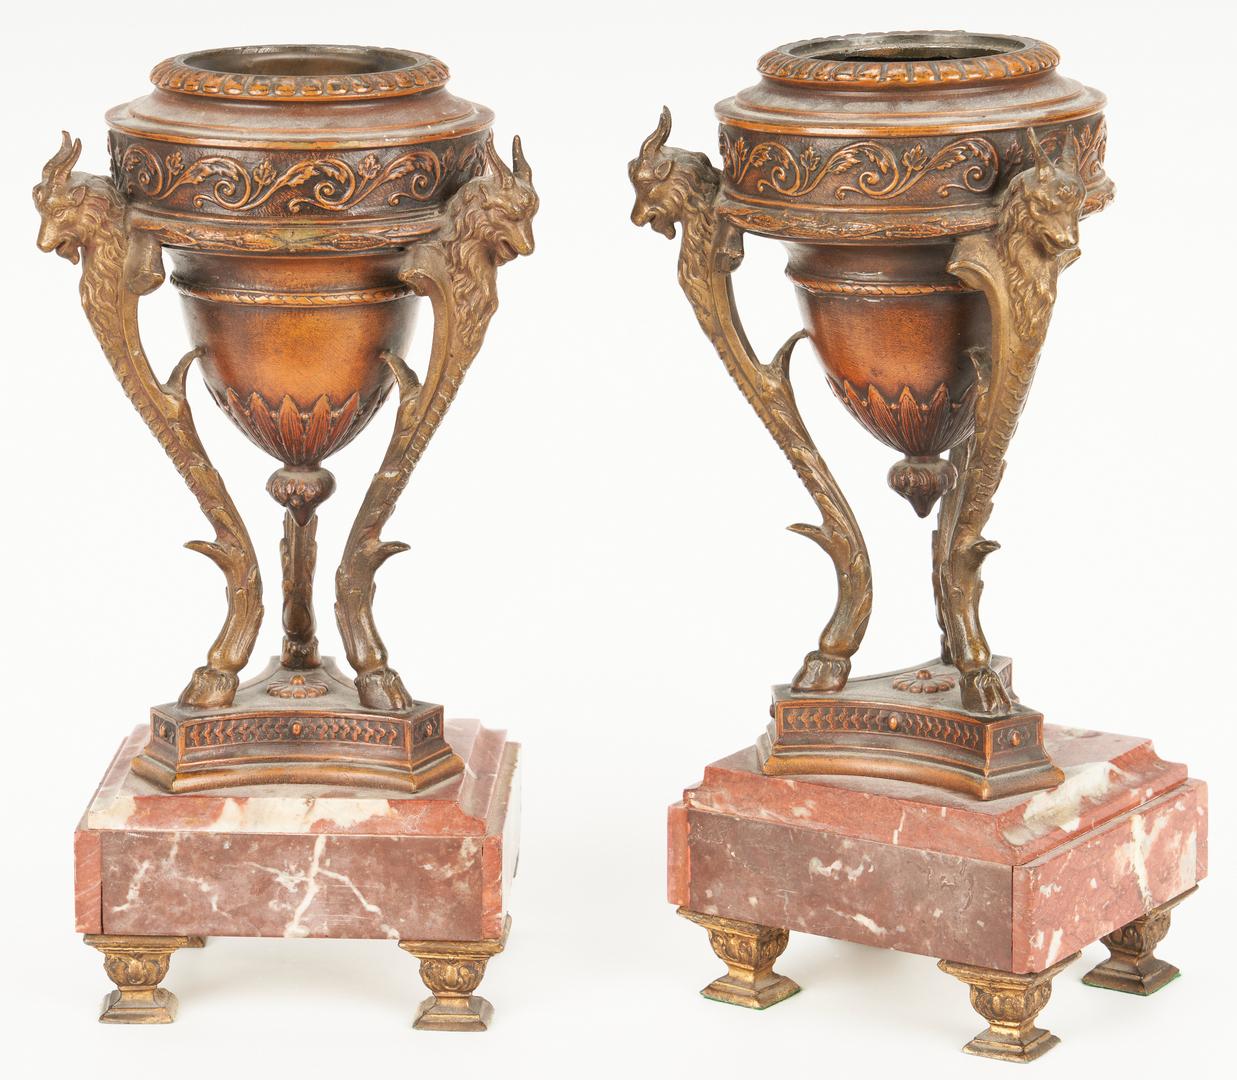 Lot 332: 3 Pc. French Figural Clock Garniture Set